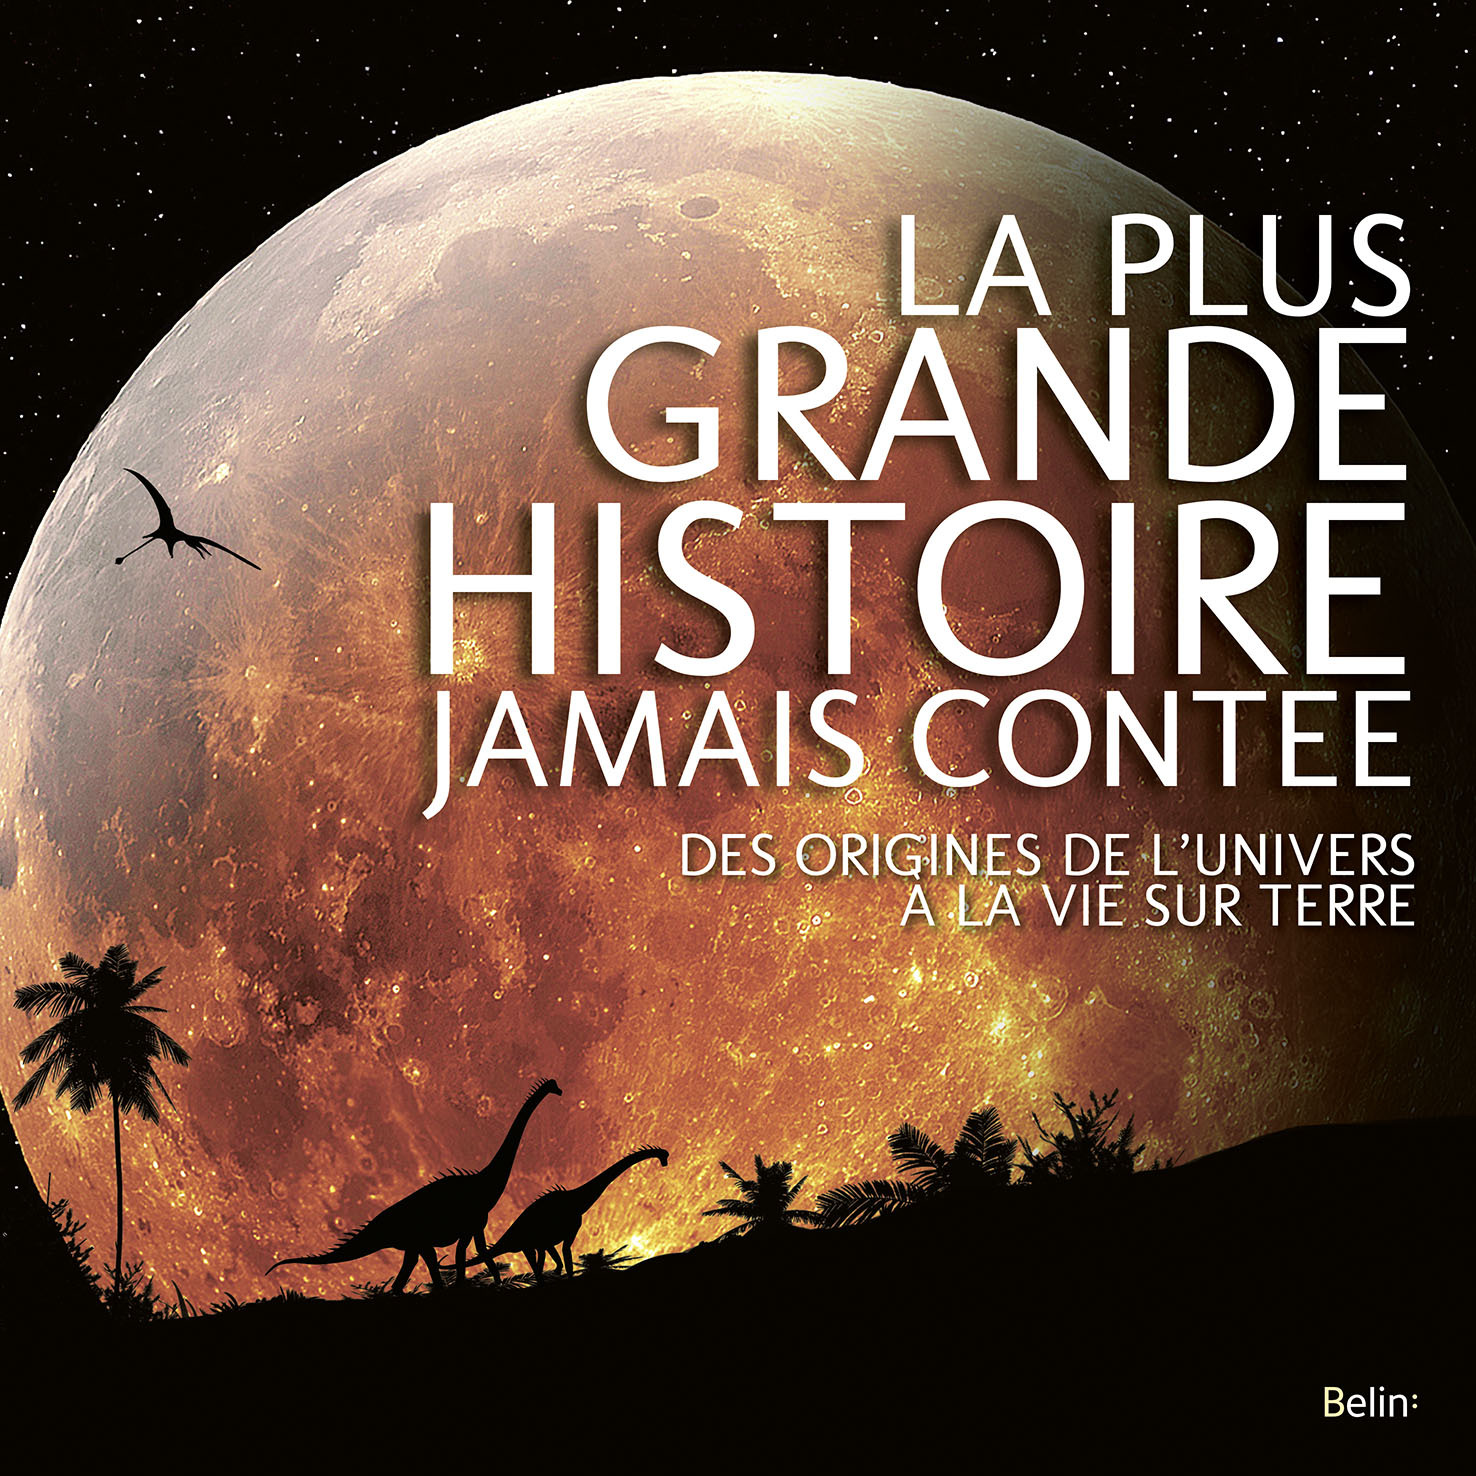 LA PLUS GRANDE HISTOIRE JAMAIS CONTEE